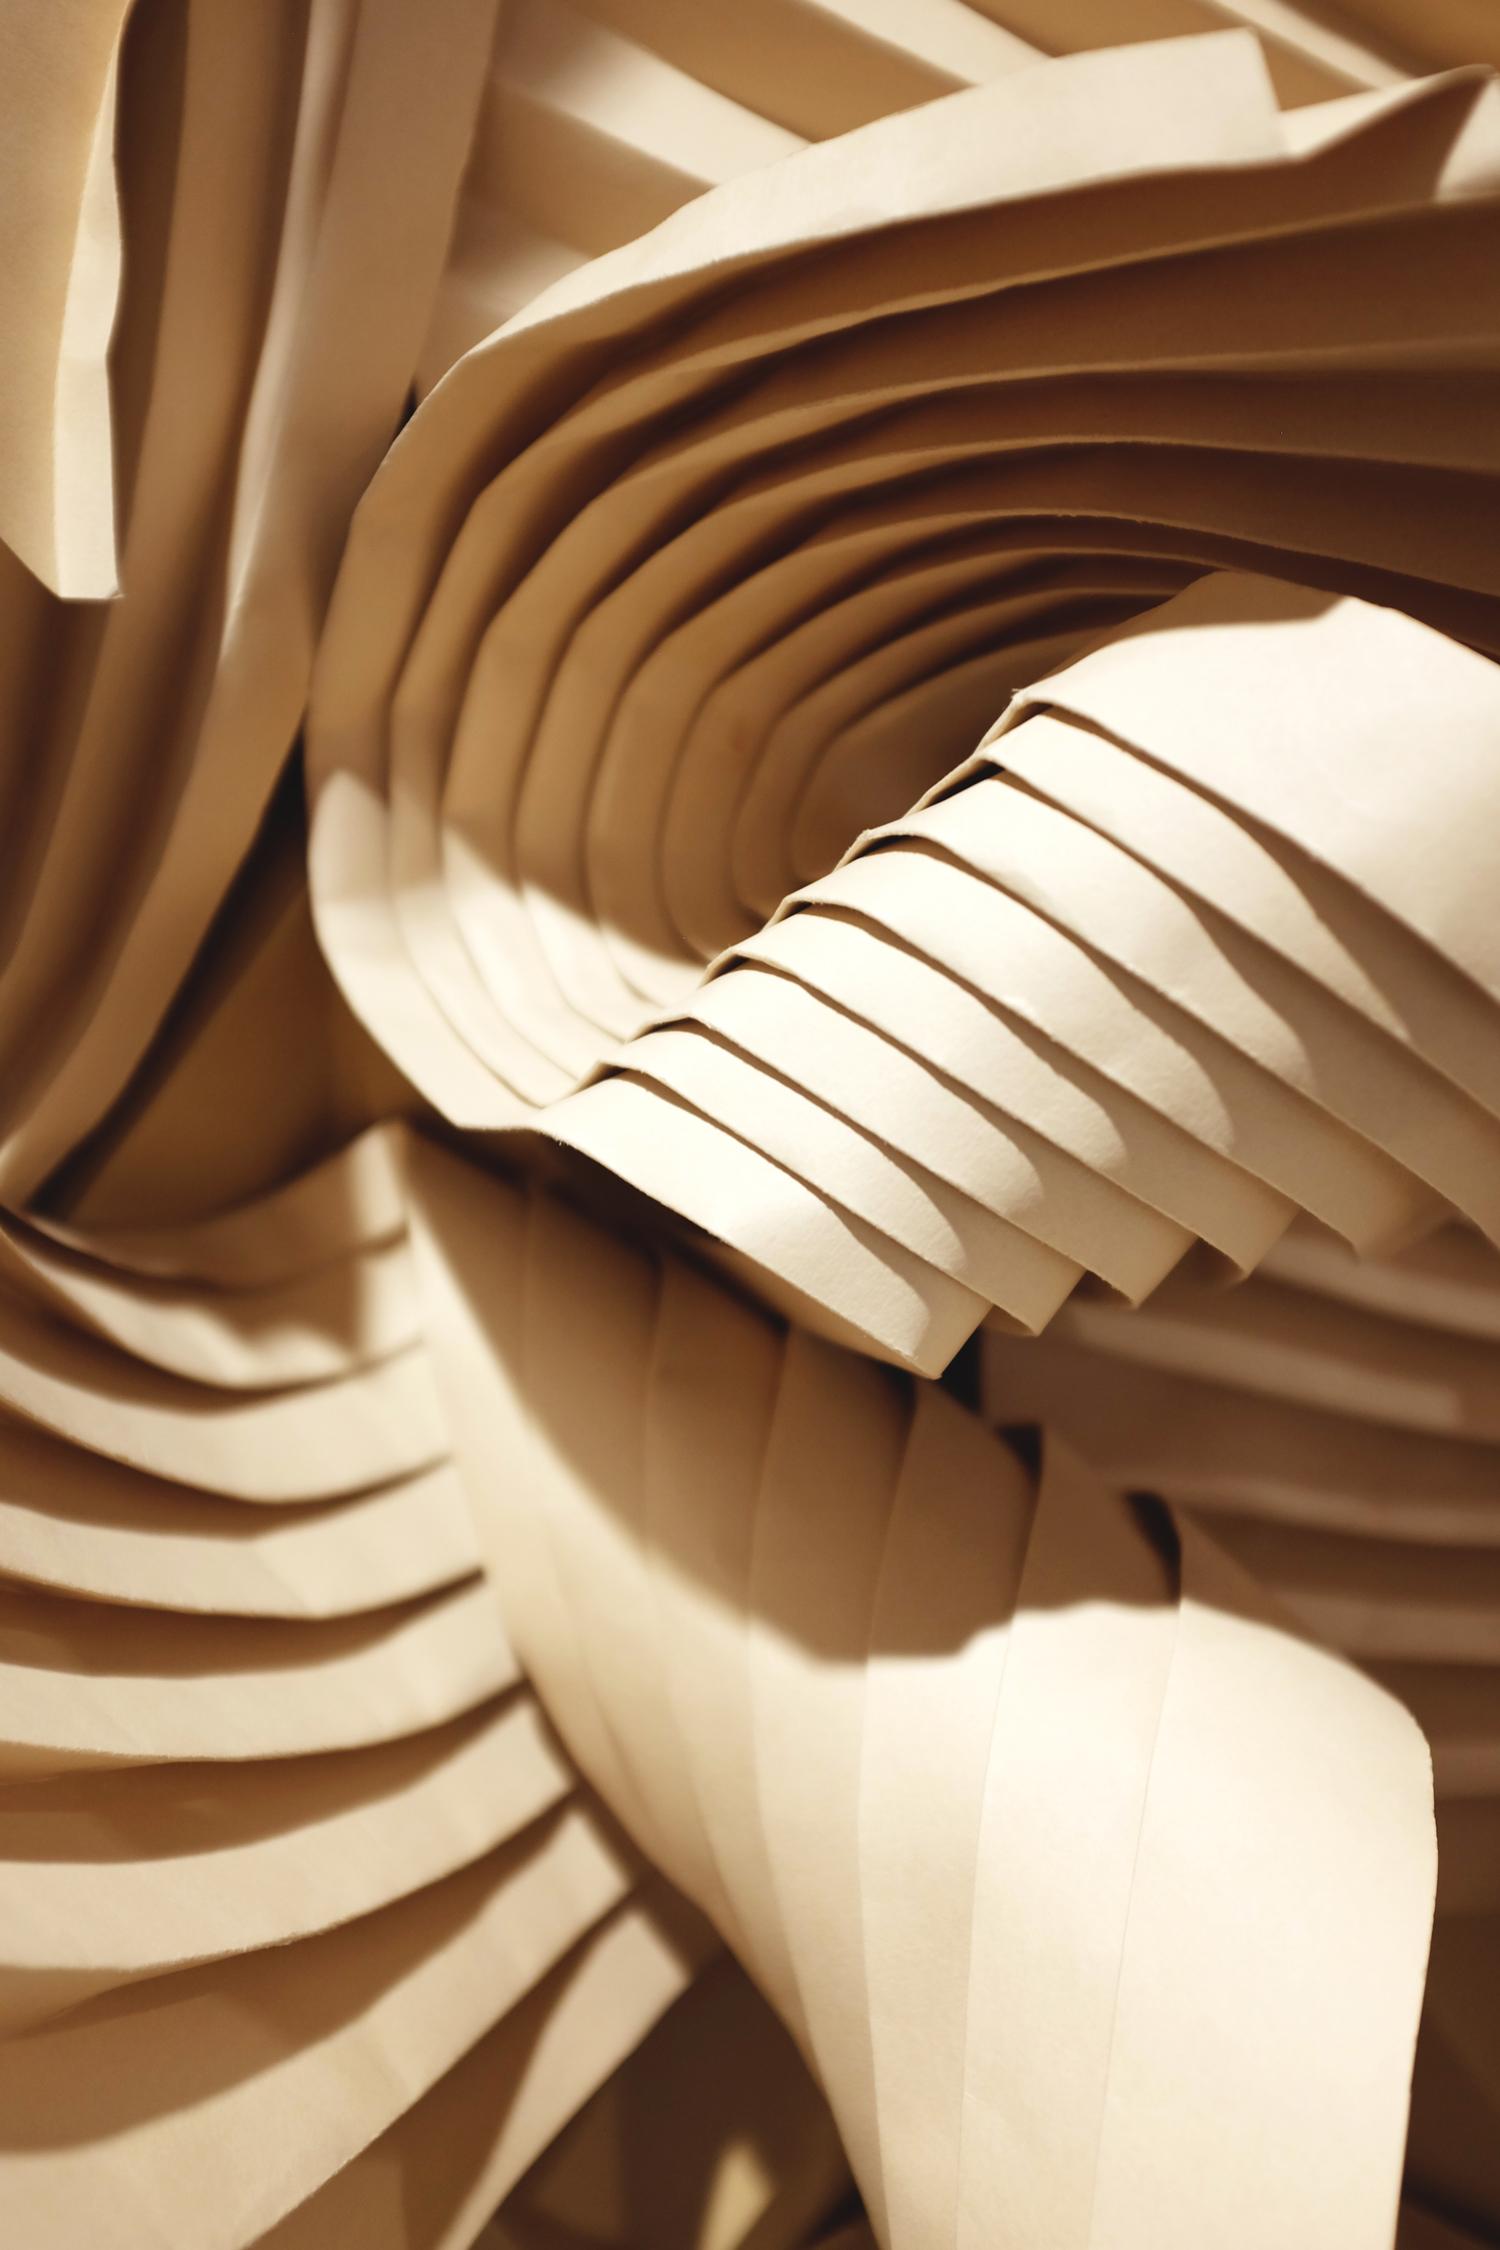 miss-cloudy-folding-paper-art-dune-knot-on-my-planet-holt-renfrew-doutzen-mural-sable-colorplan-pauline-loctin-16.jpg